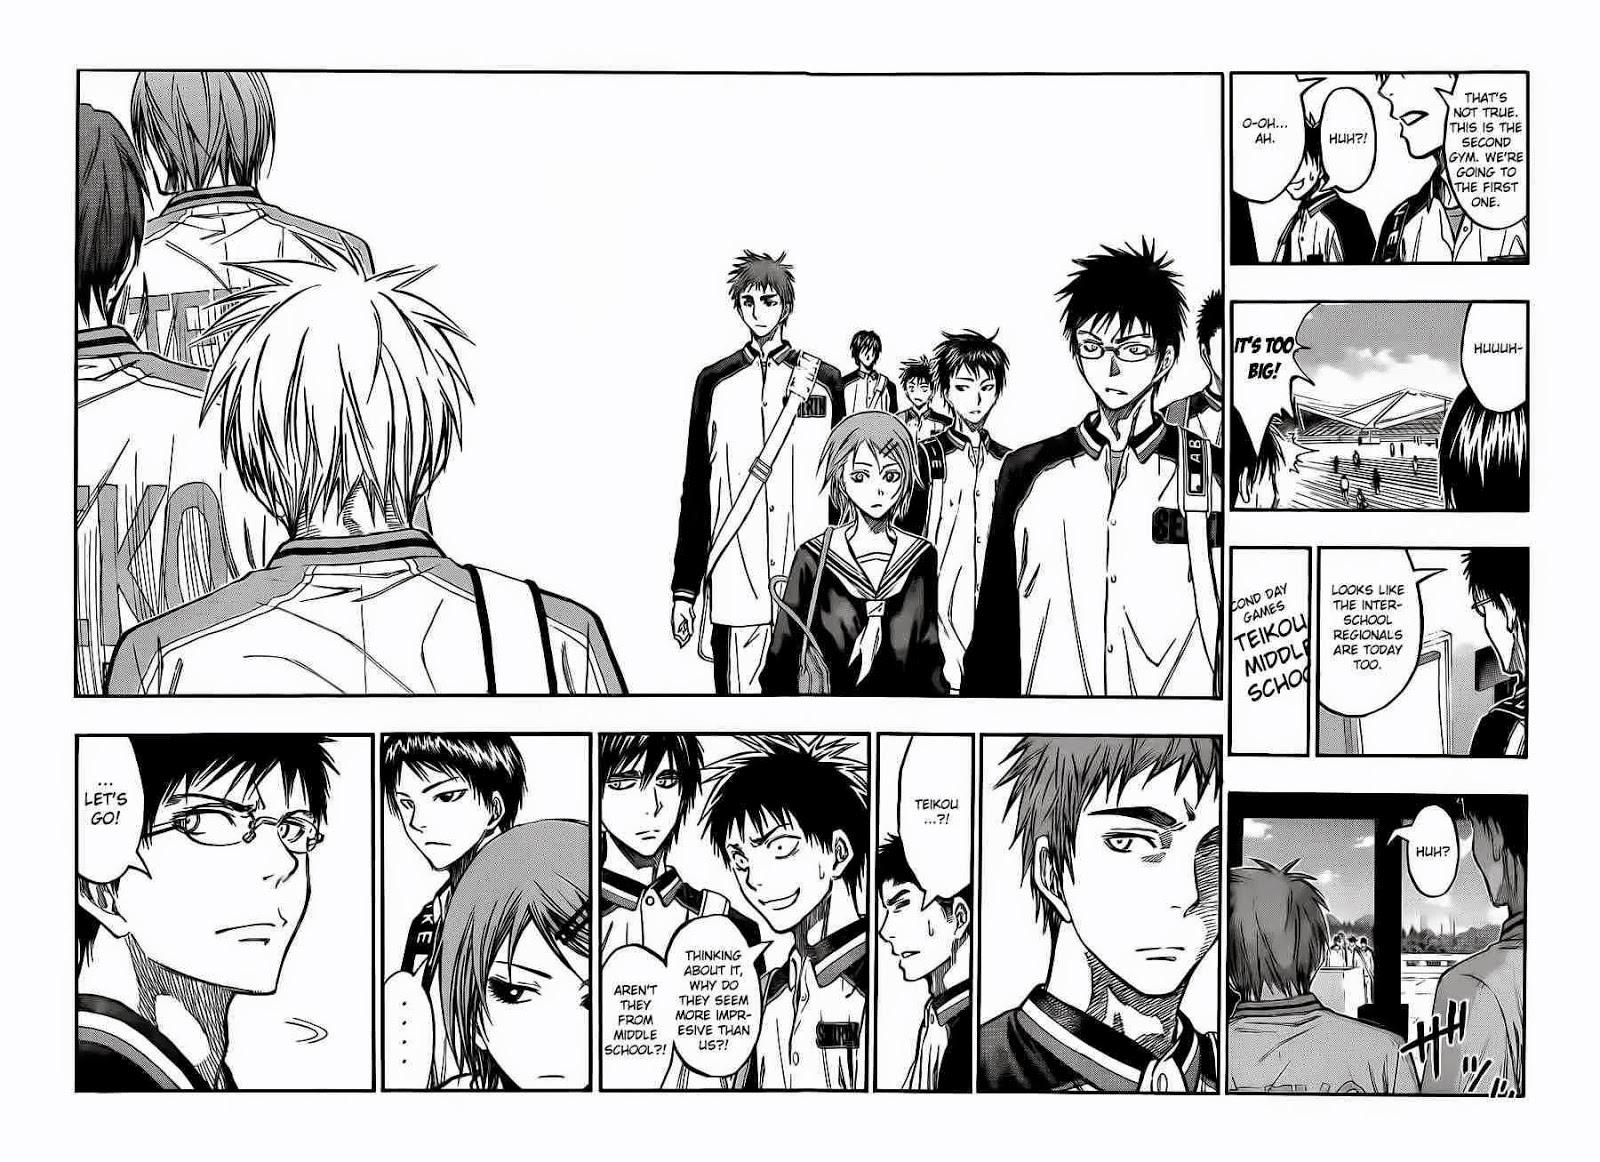 Kuroko no Basket Manga Chapter 224 - Image 14-14